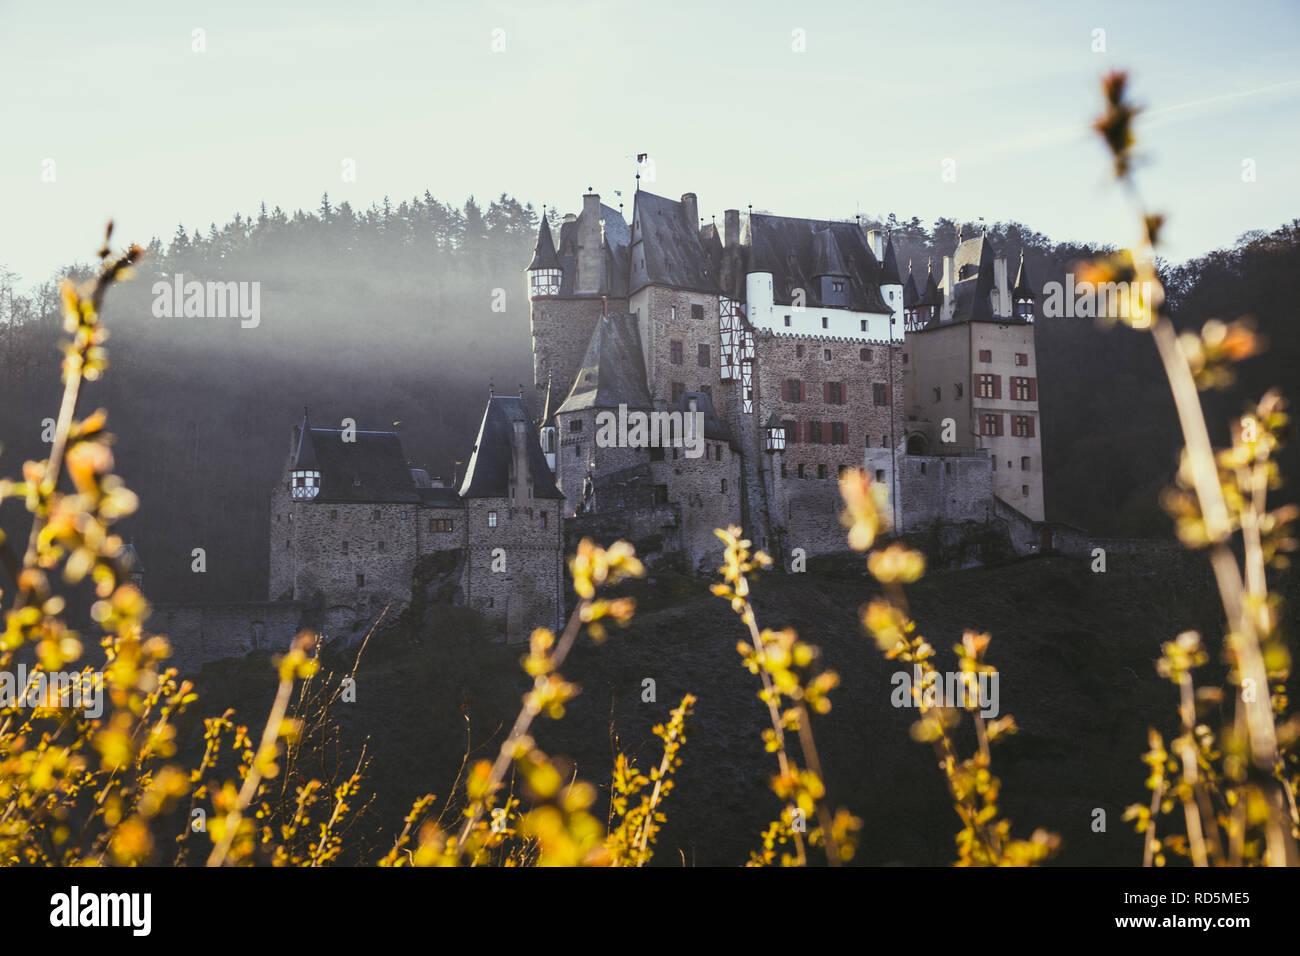 Beautiful view of famous Eltz Castle in scenic golden morning light at sunrise in fall, Wierschem, Rheinland-Pfalz, Germany - Stock Image